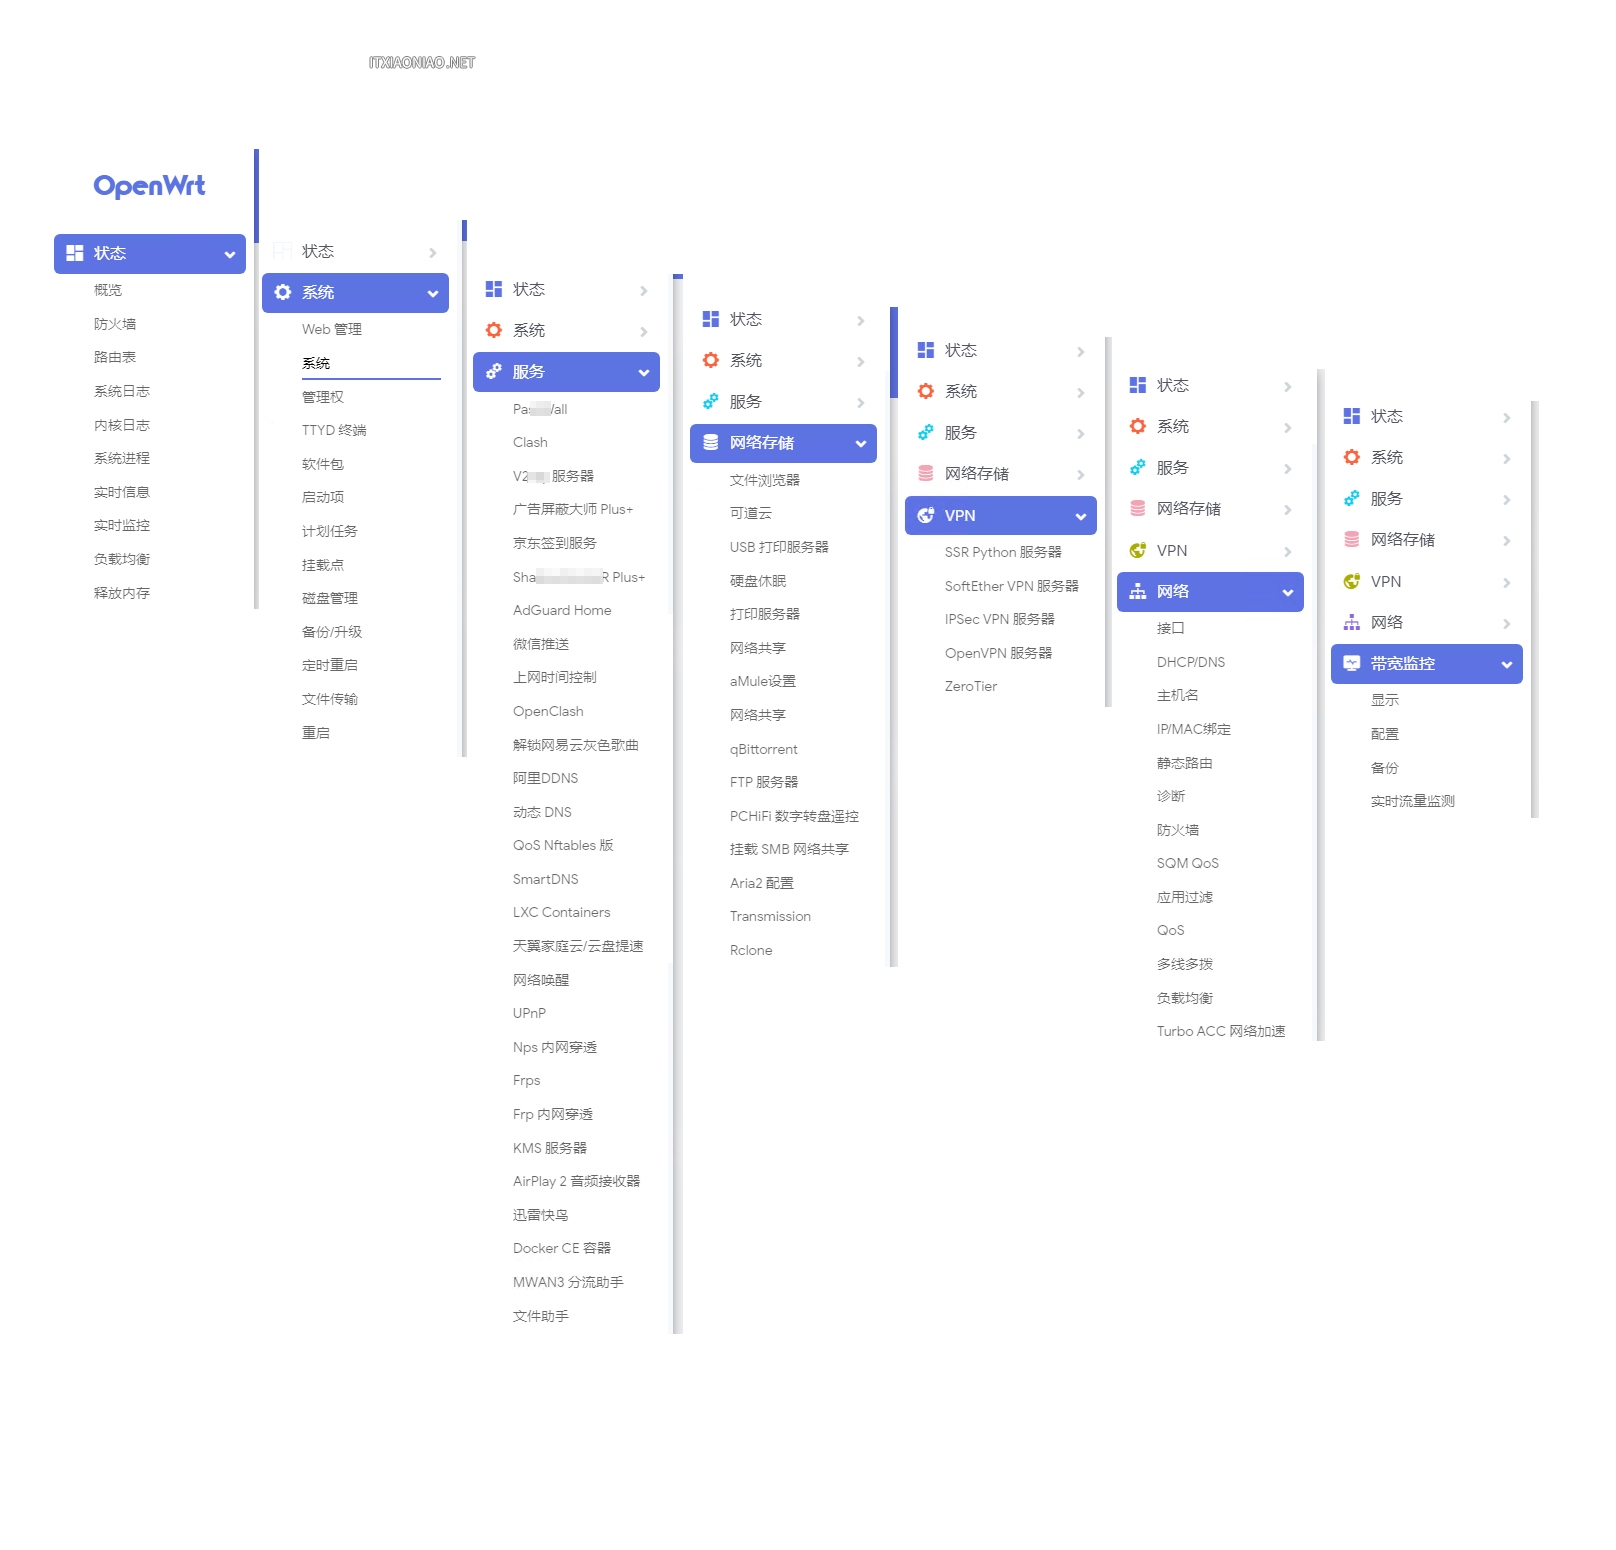 OpenWrt R20.12.12 X86-64软路由 编译 多功能稳定版ipv6/多线多拨/smartdns/酸酸乳/应用过滤/SFE加速